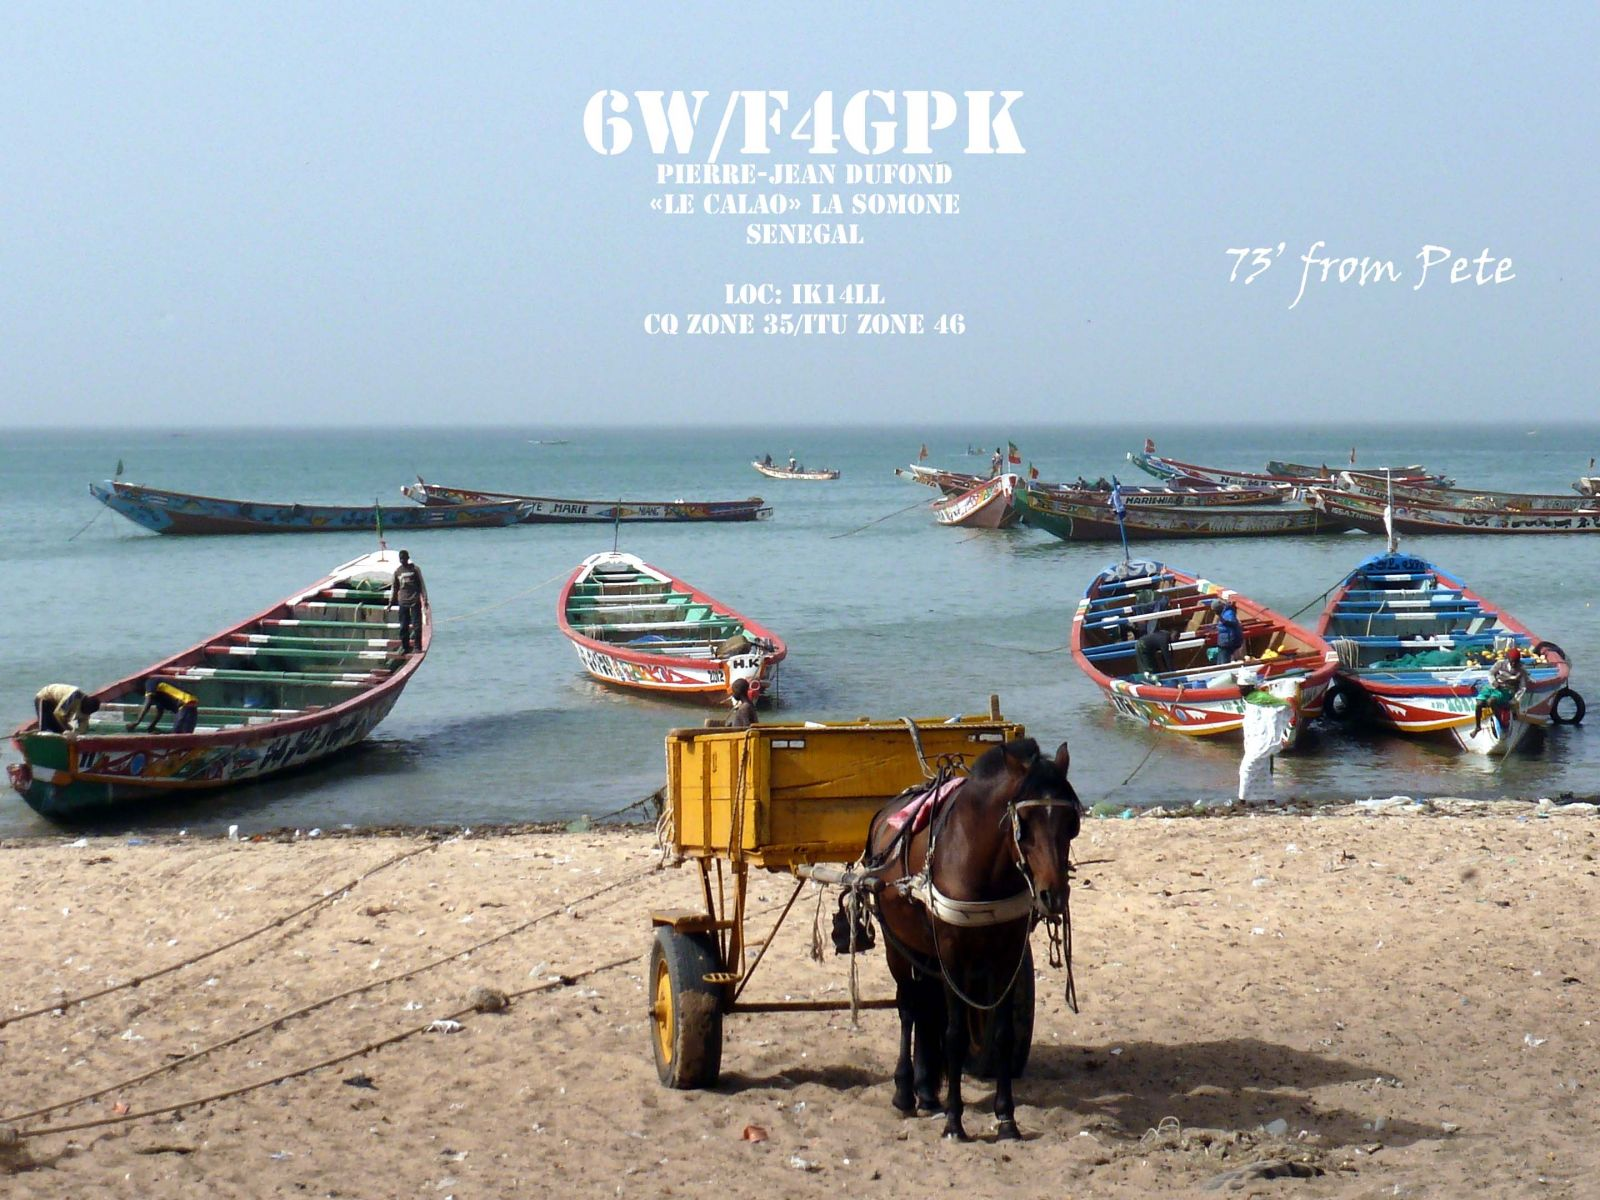 Senegal 6W/F4GPK